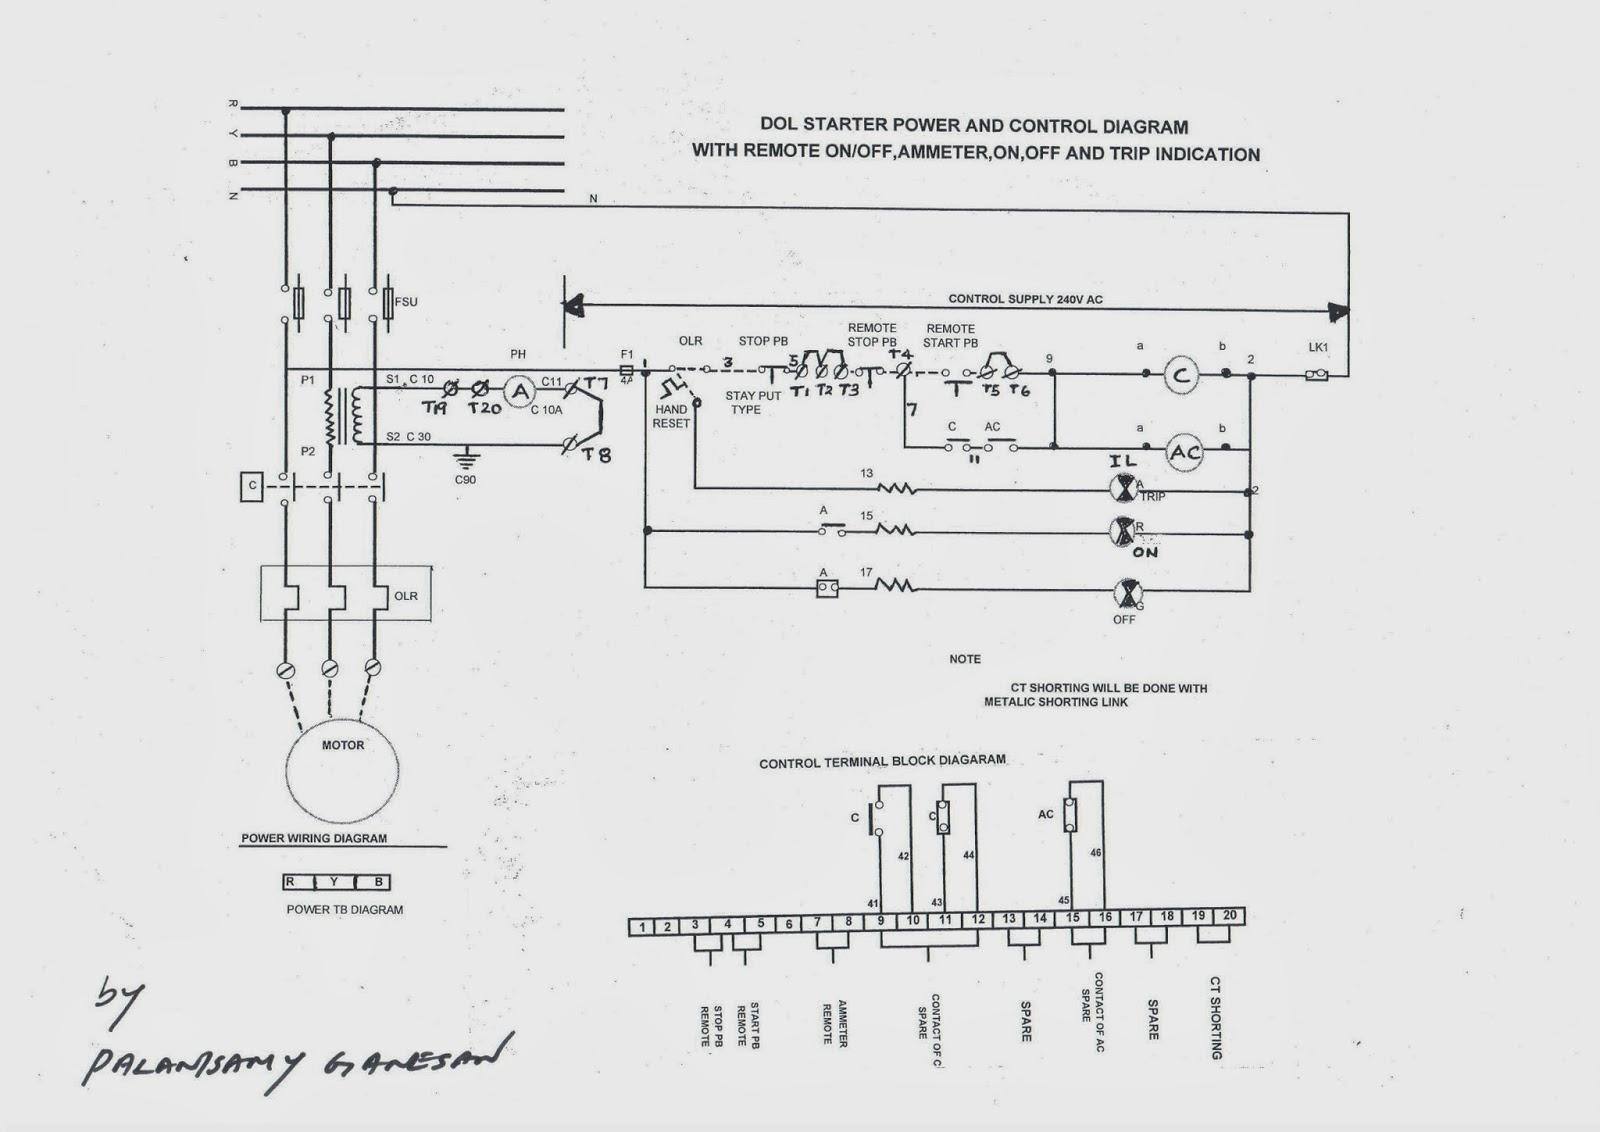 medium resolution of control wiring diagram of dol starter